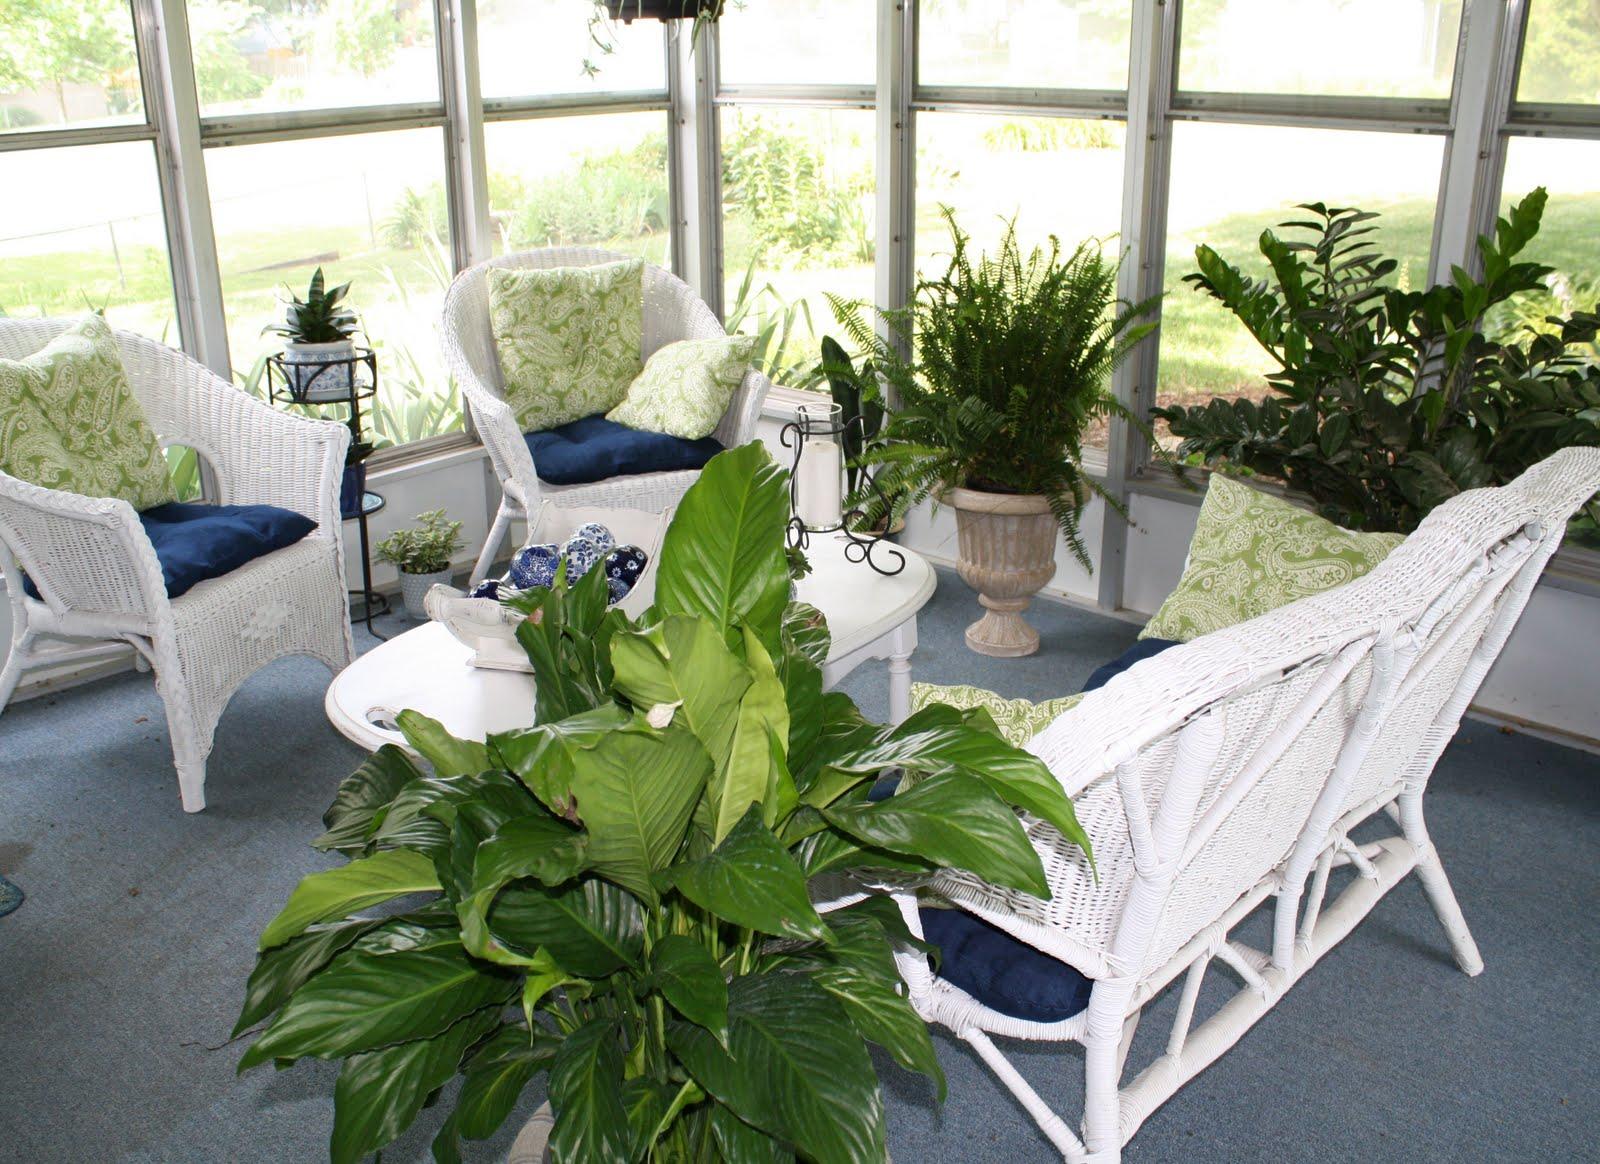 Step2 Corvette Bedroom Set Gardening Chair Garden Furniture Silhouettes Illustration